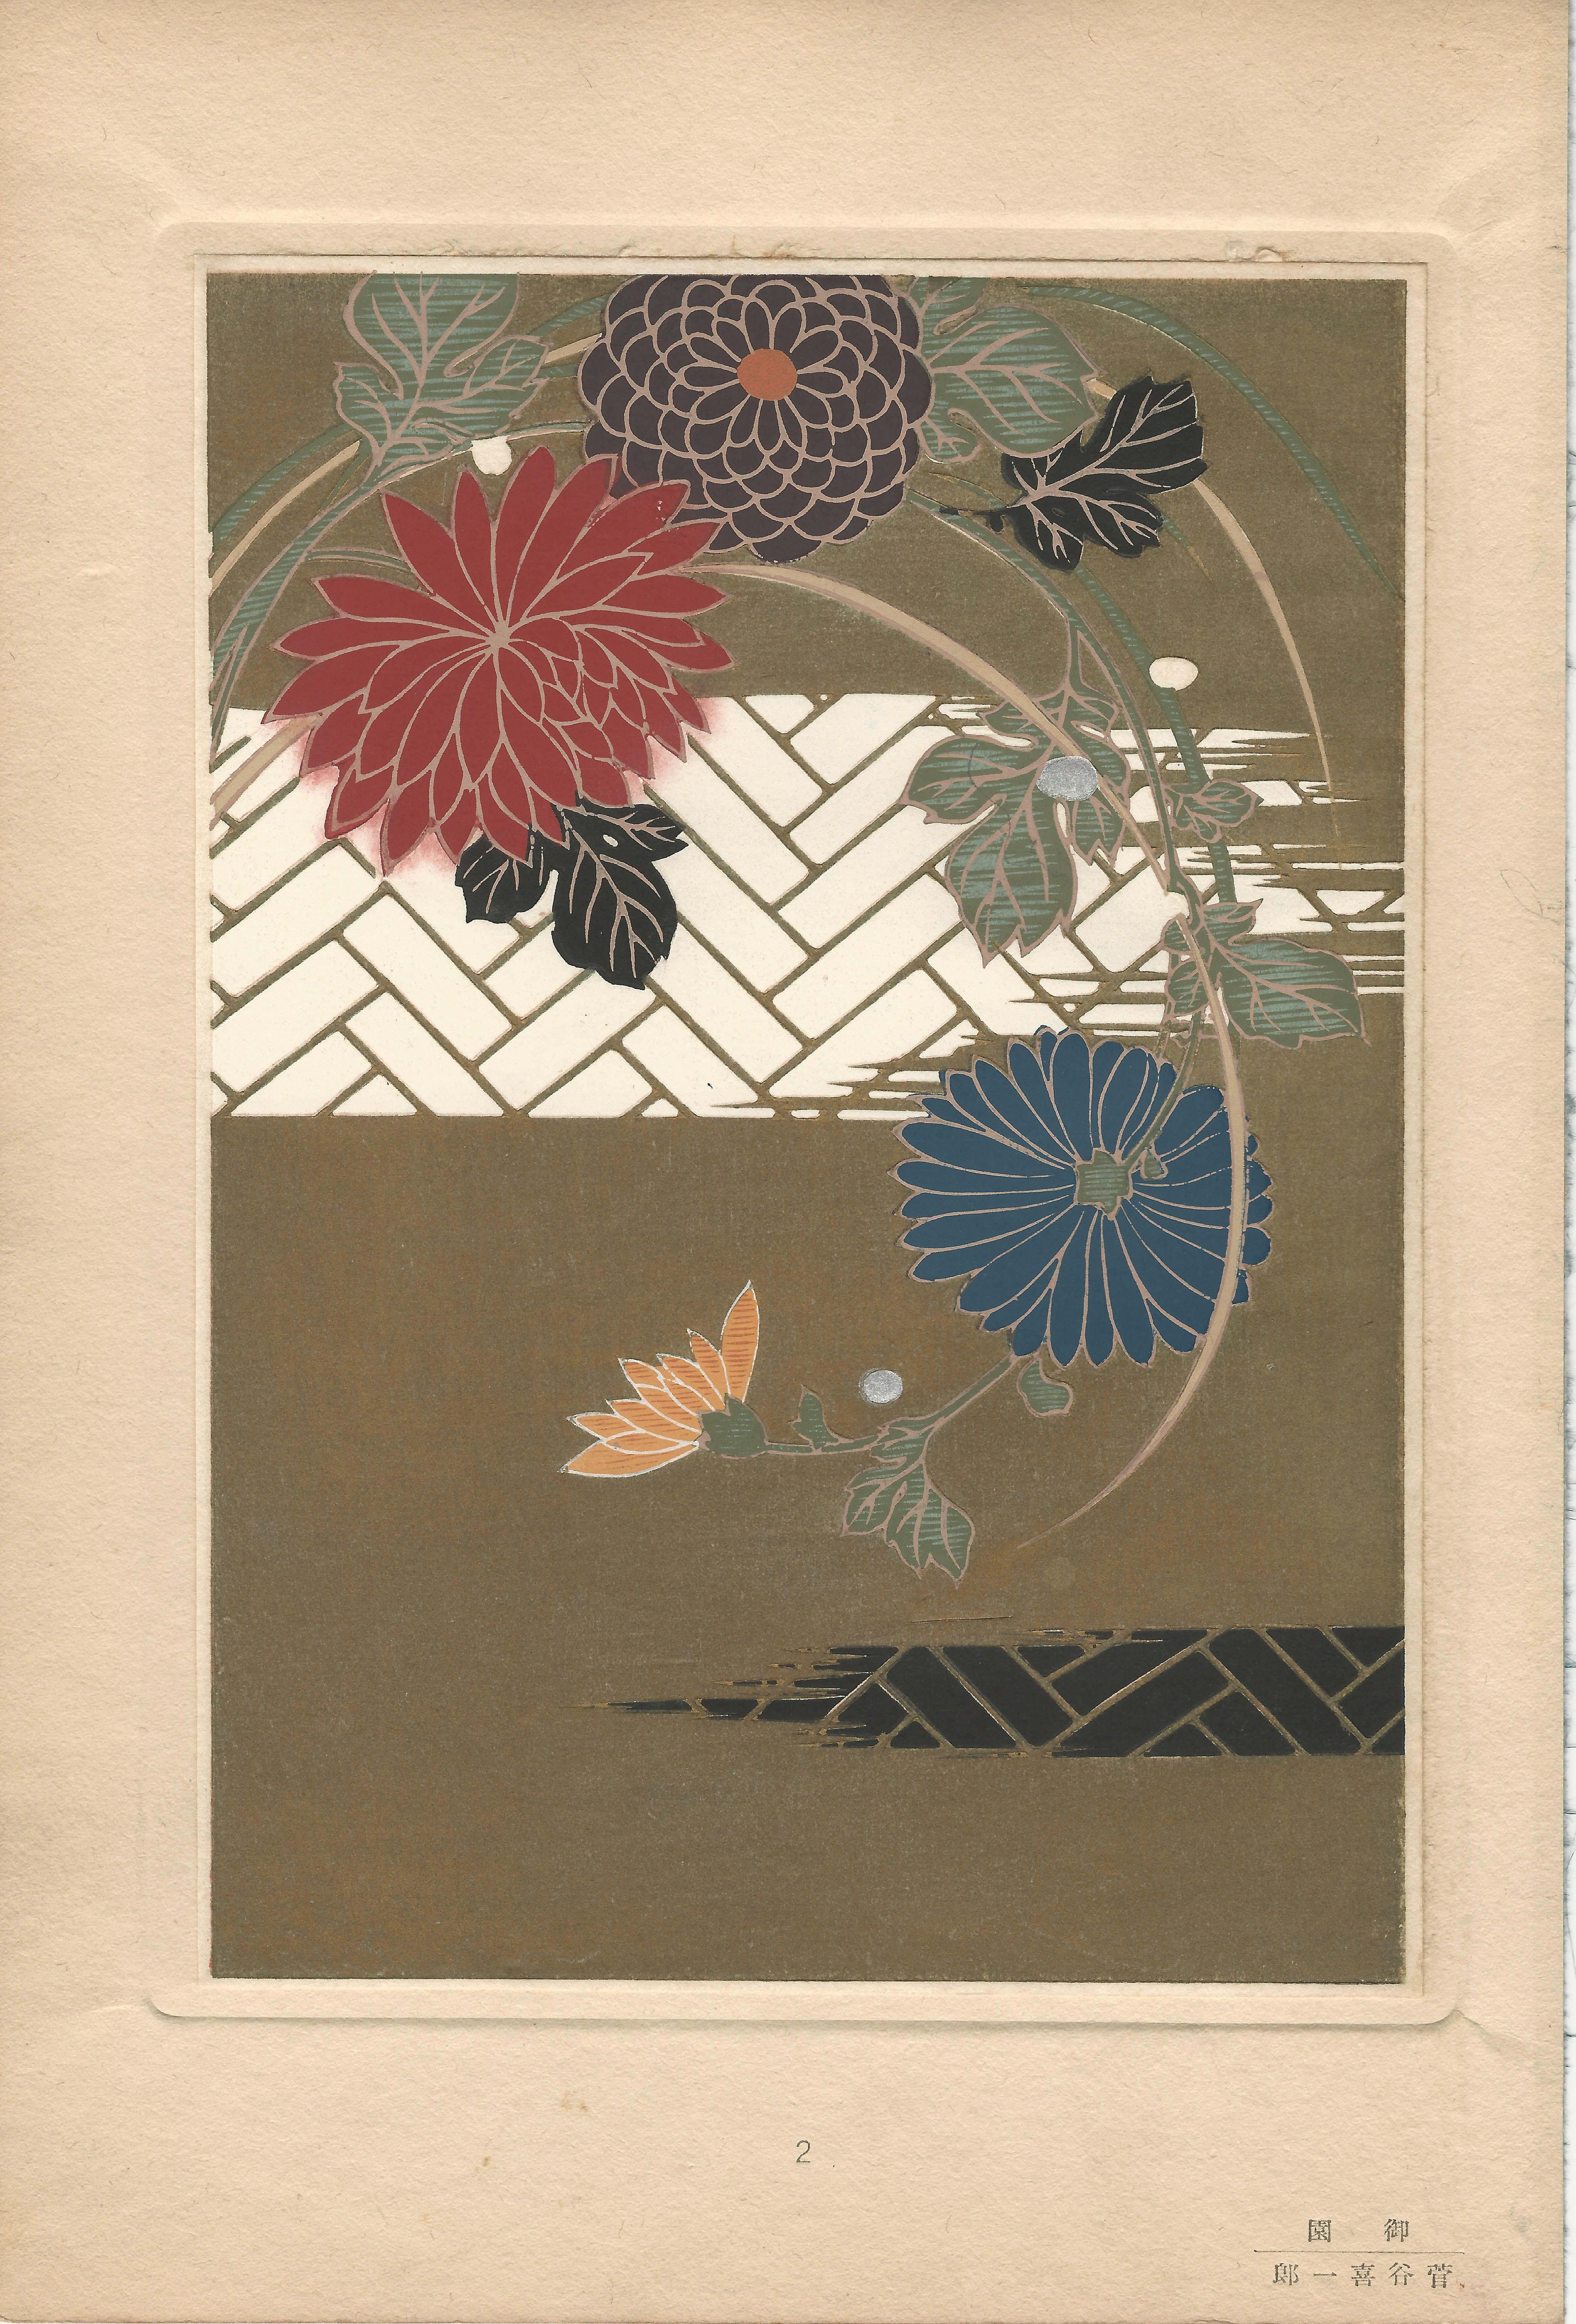 Sugaya KIICHIRO (Giappone, attivo inizi XX secolo) – CRISANTEMI